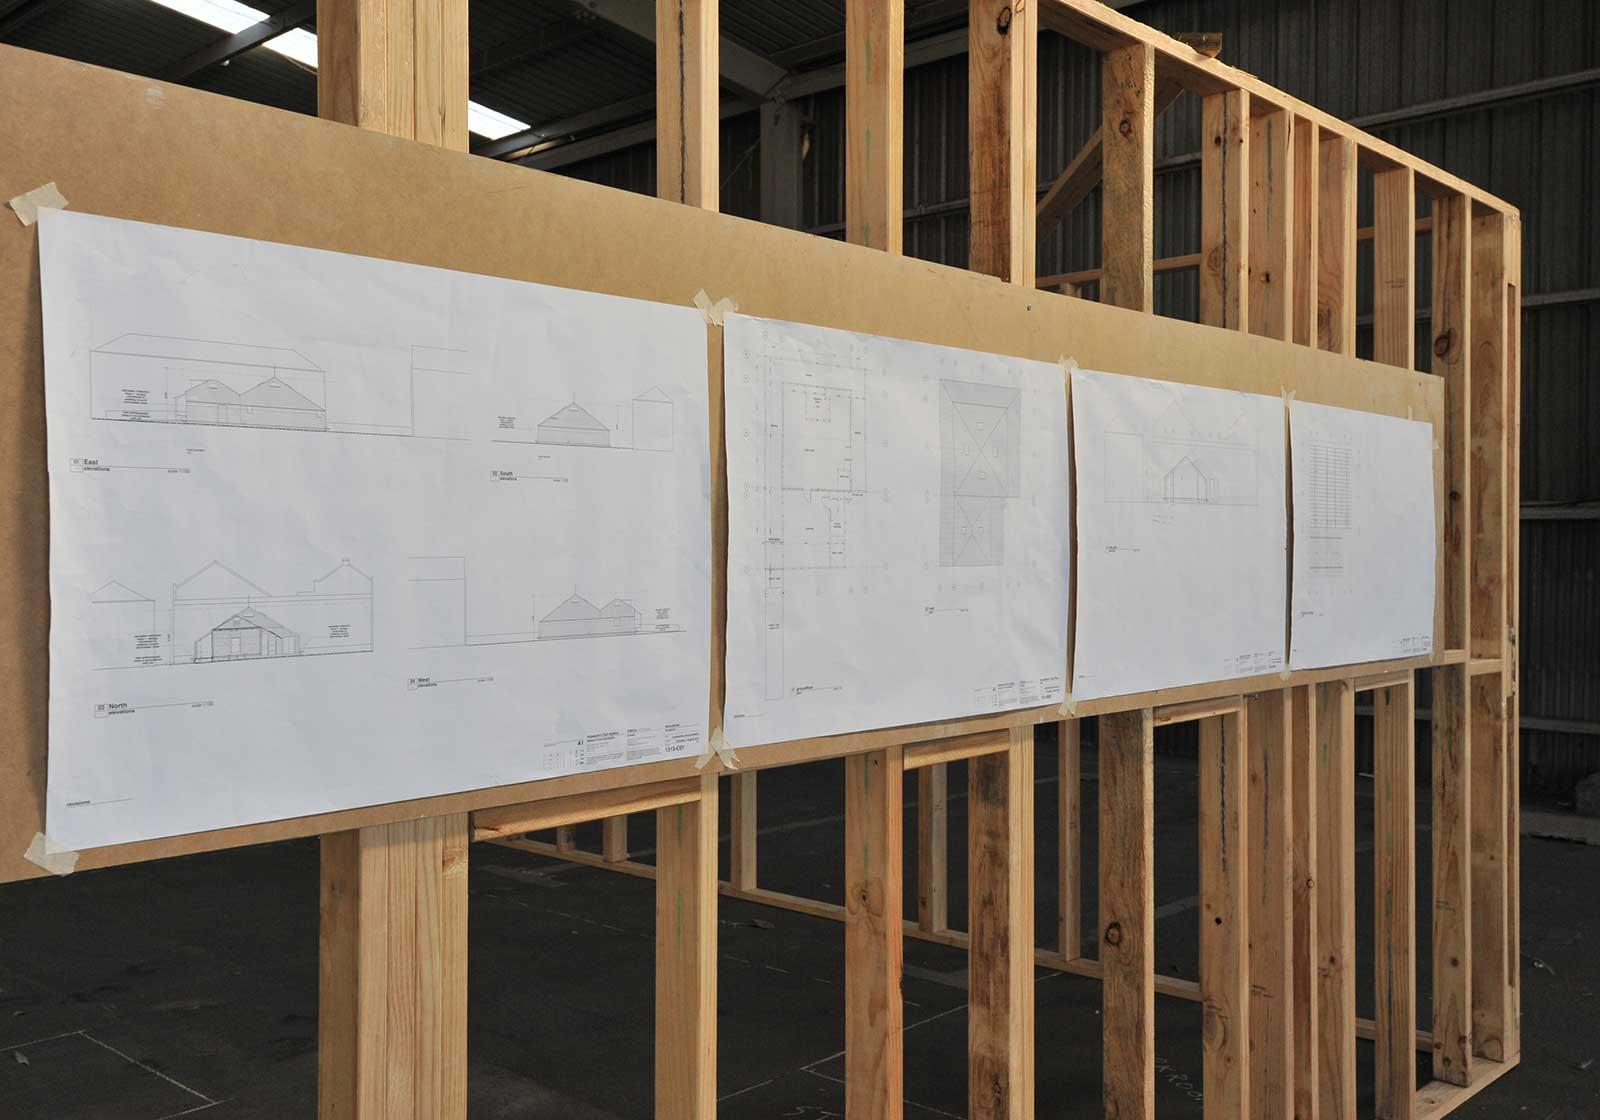 Replica-Build-construct-13